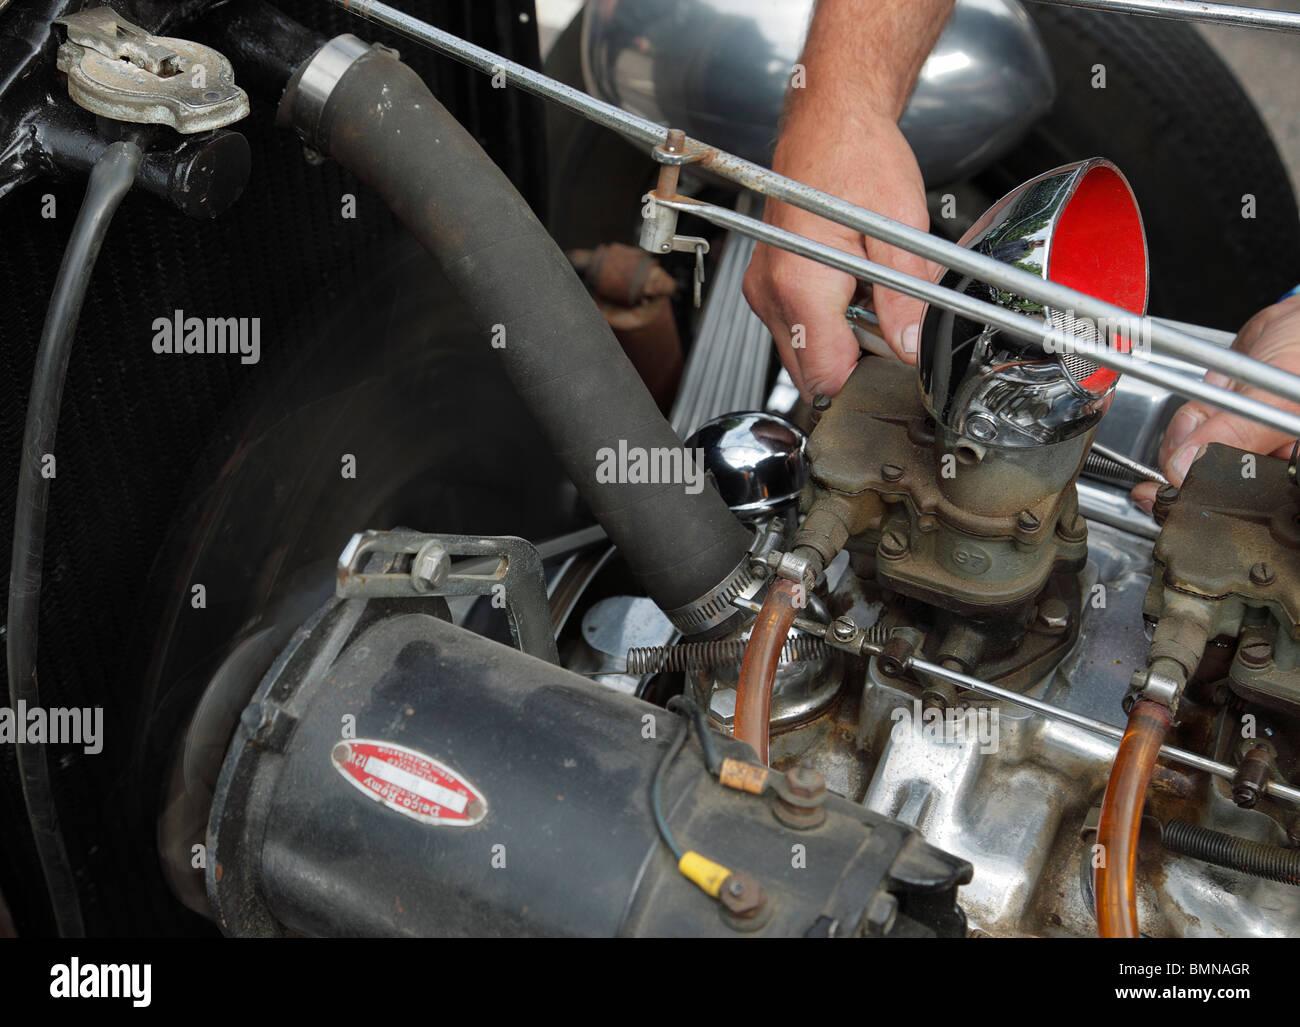 Car Carburettor Stockfotos & Car Carburettor Bilder - Seite 2 - Alamy